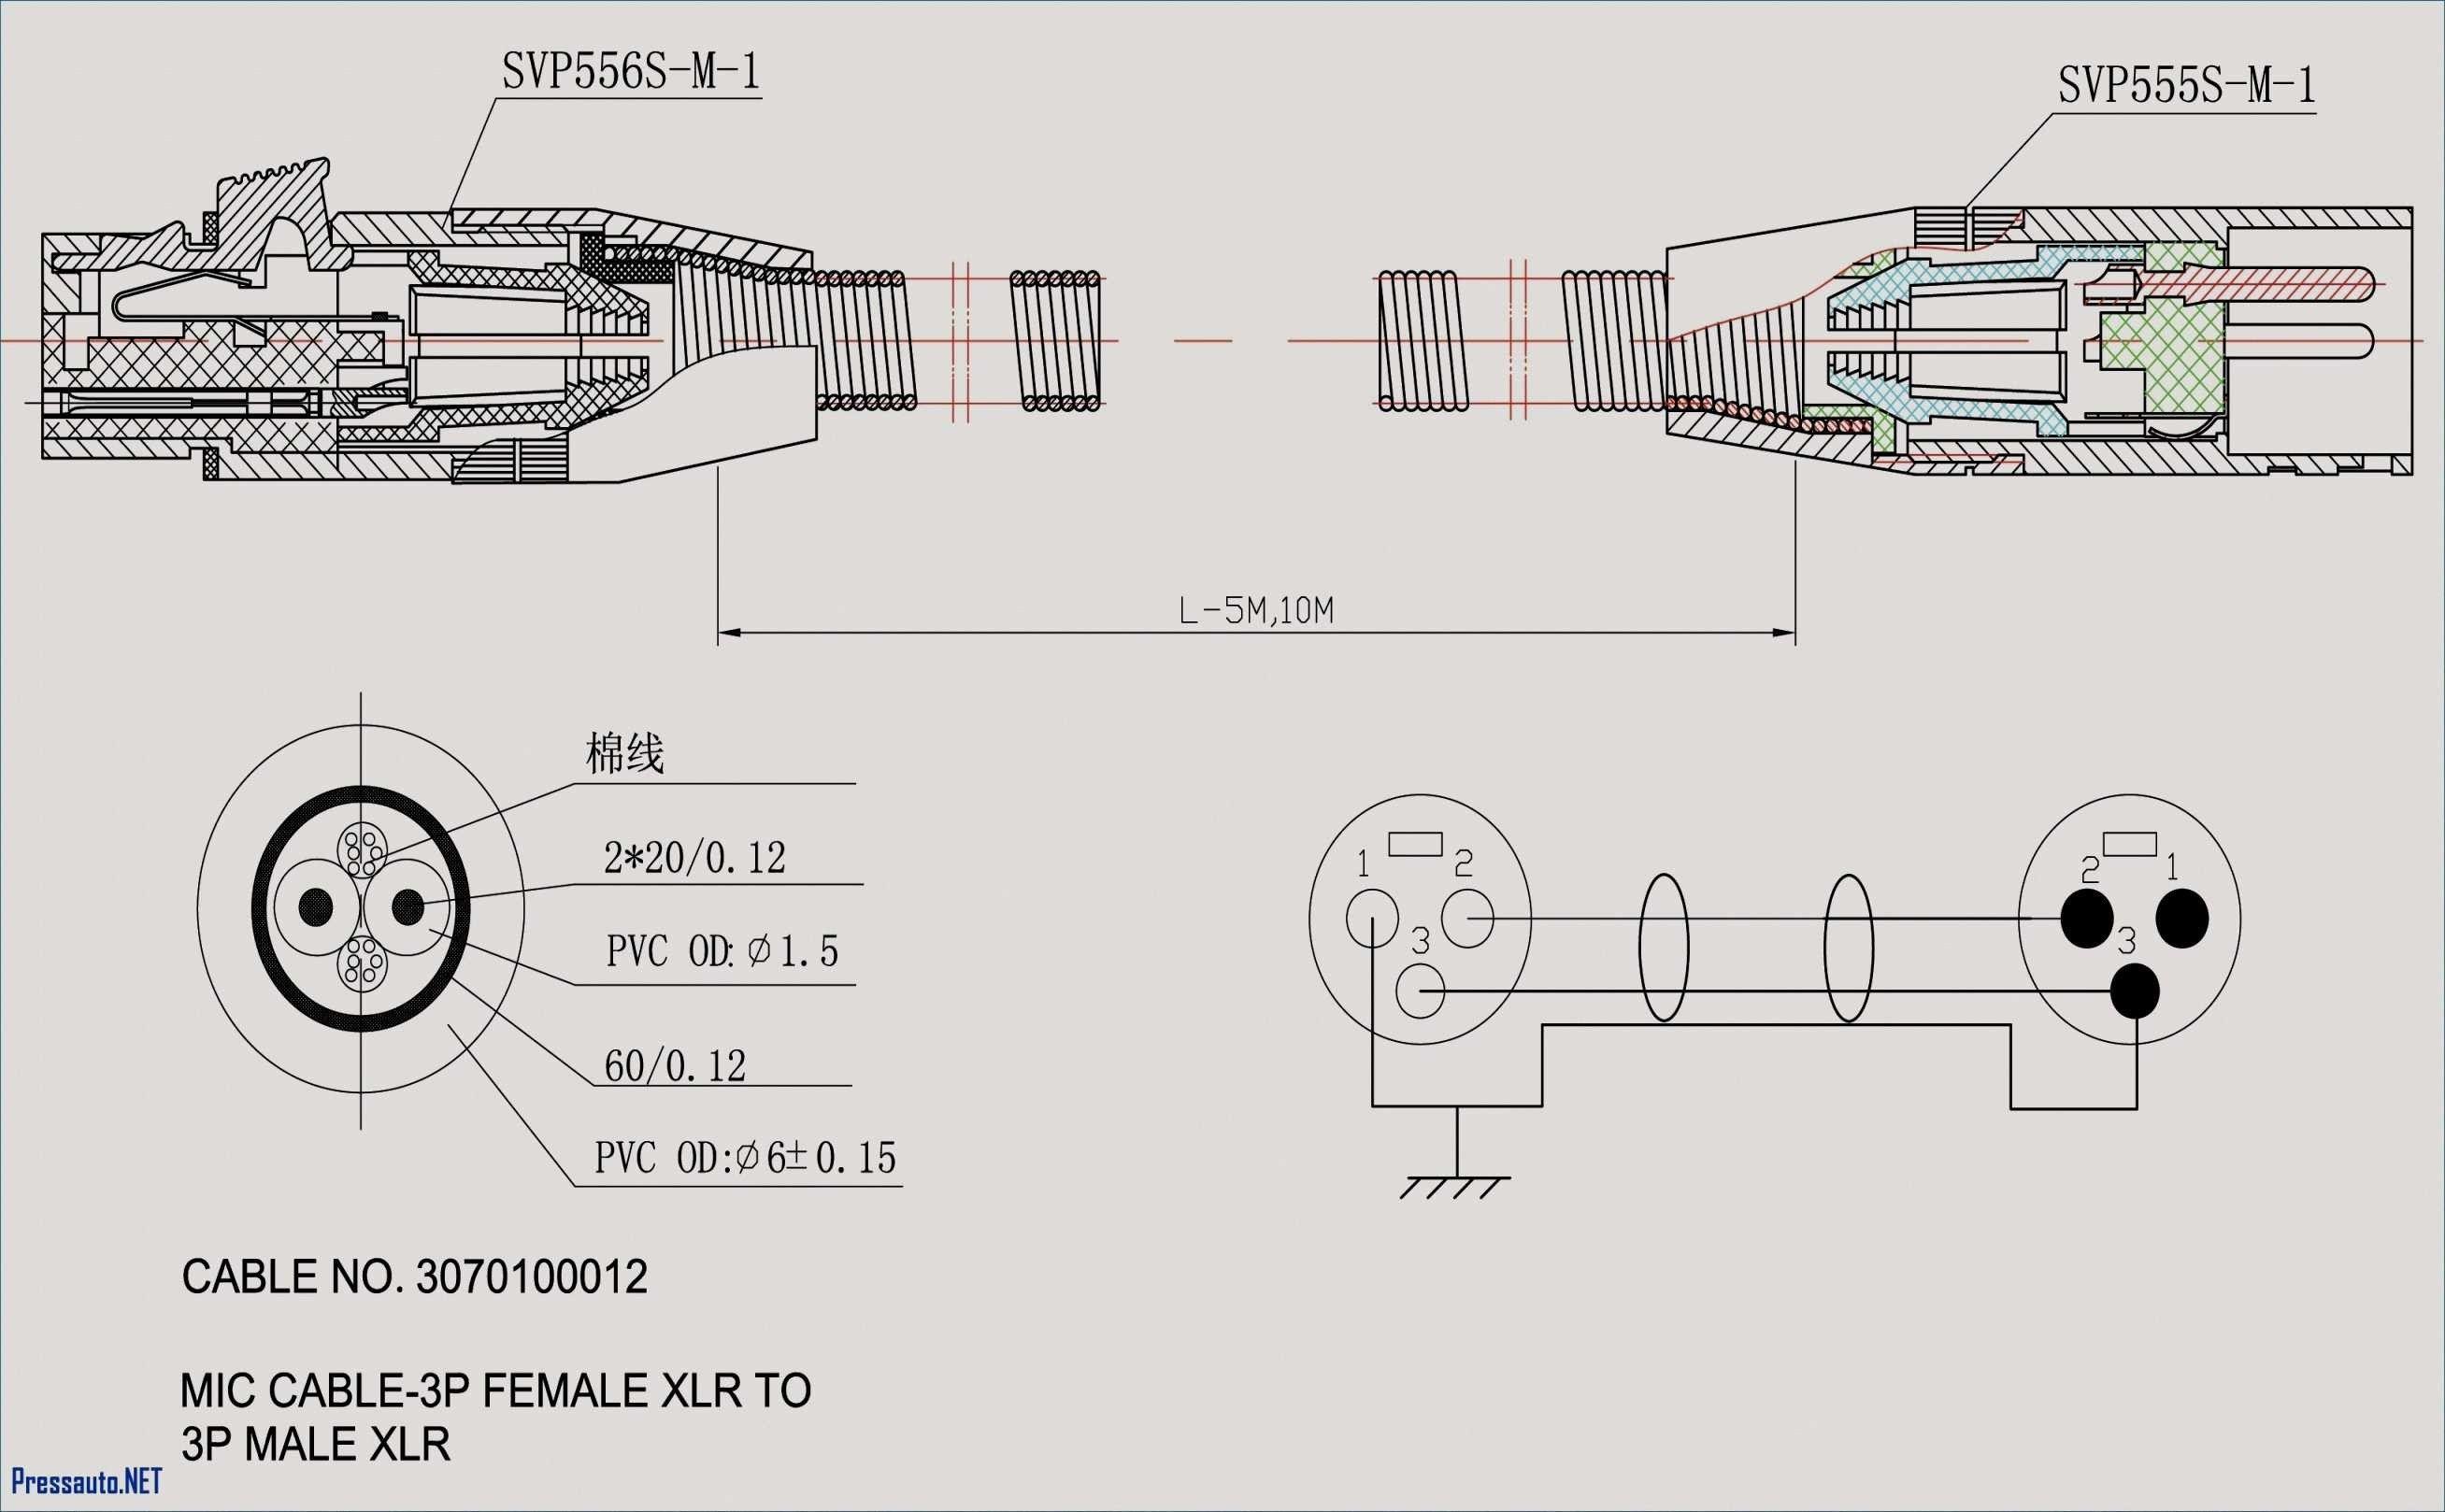 Unique Wiring Diagram Ac Samsung Electrical Wiring Diagram Trailer Wiring Diagram Alternator